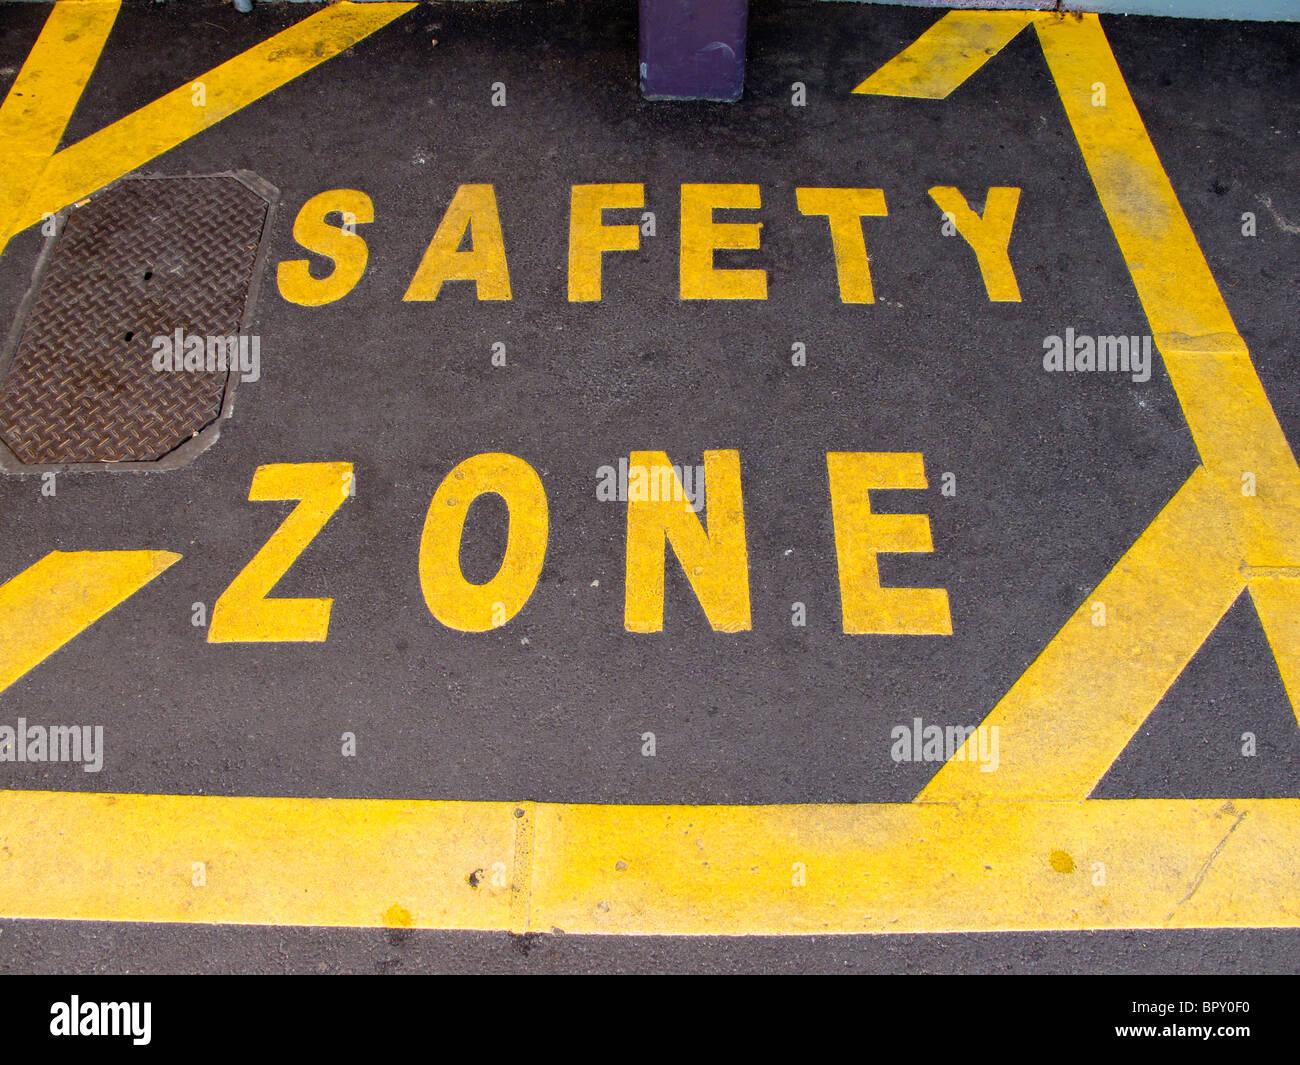 Safety zone markings - Stock Image